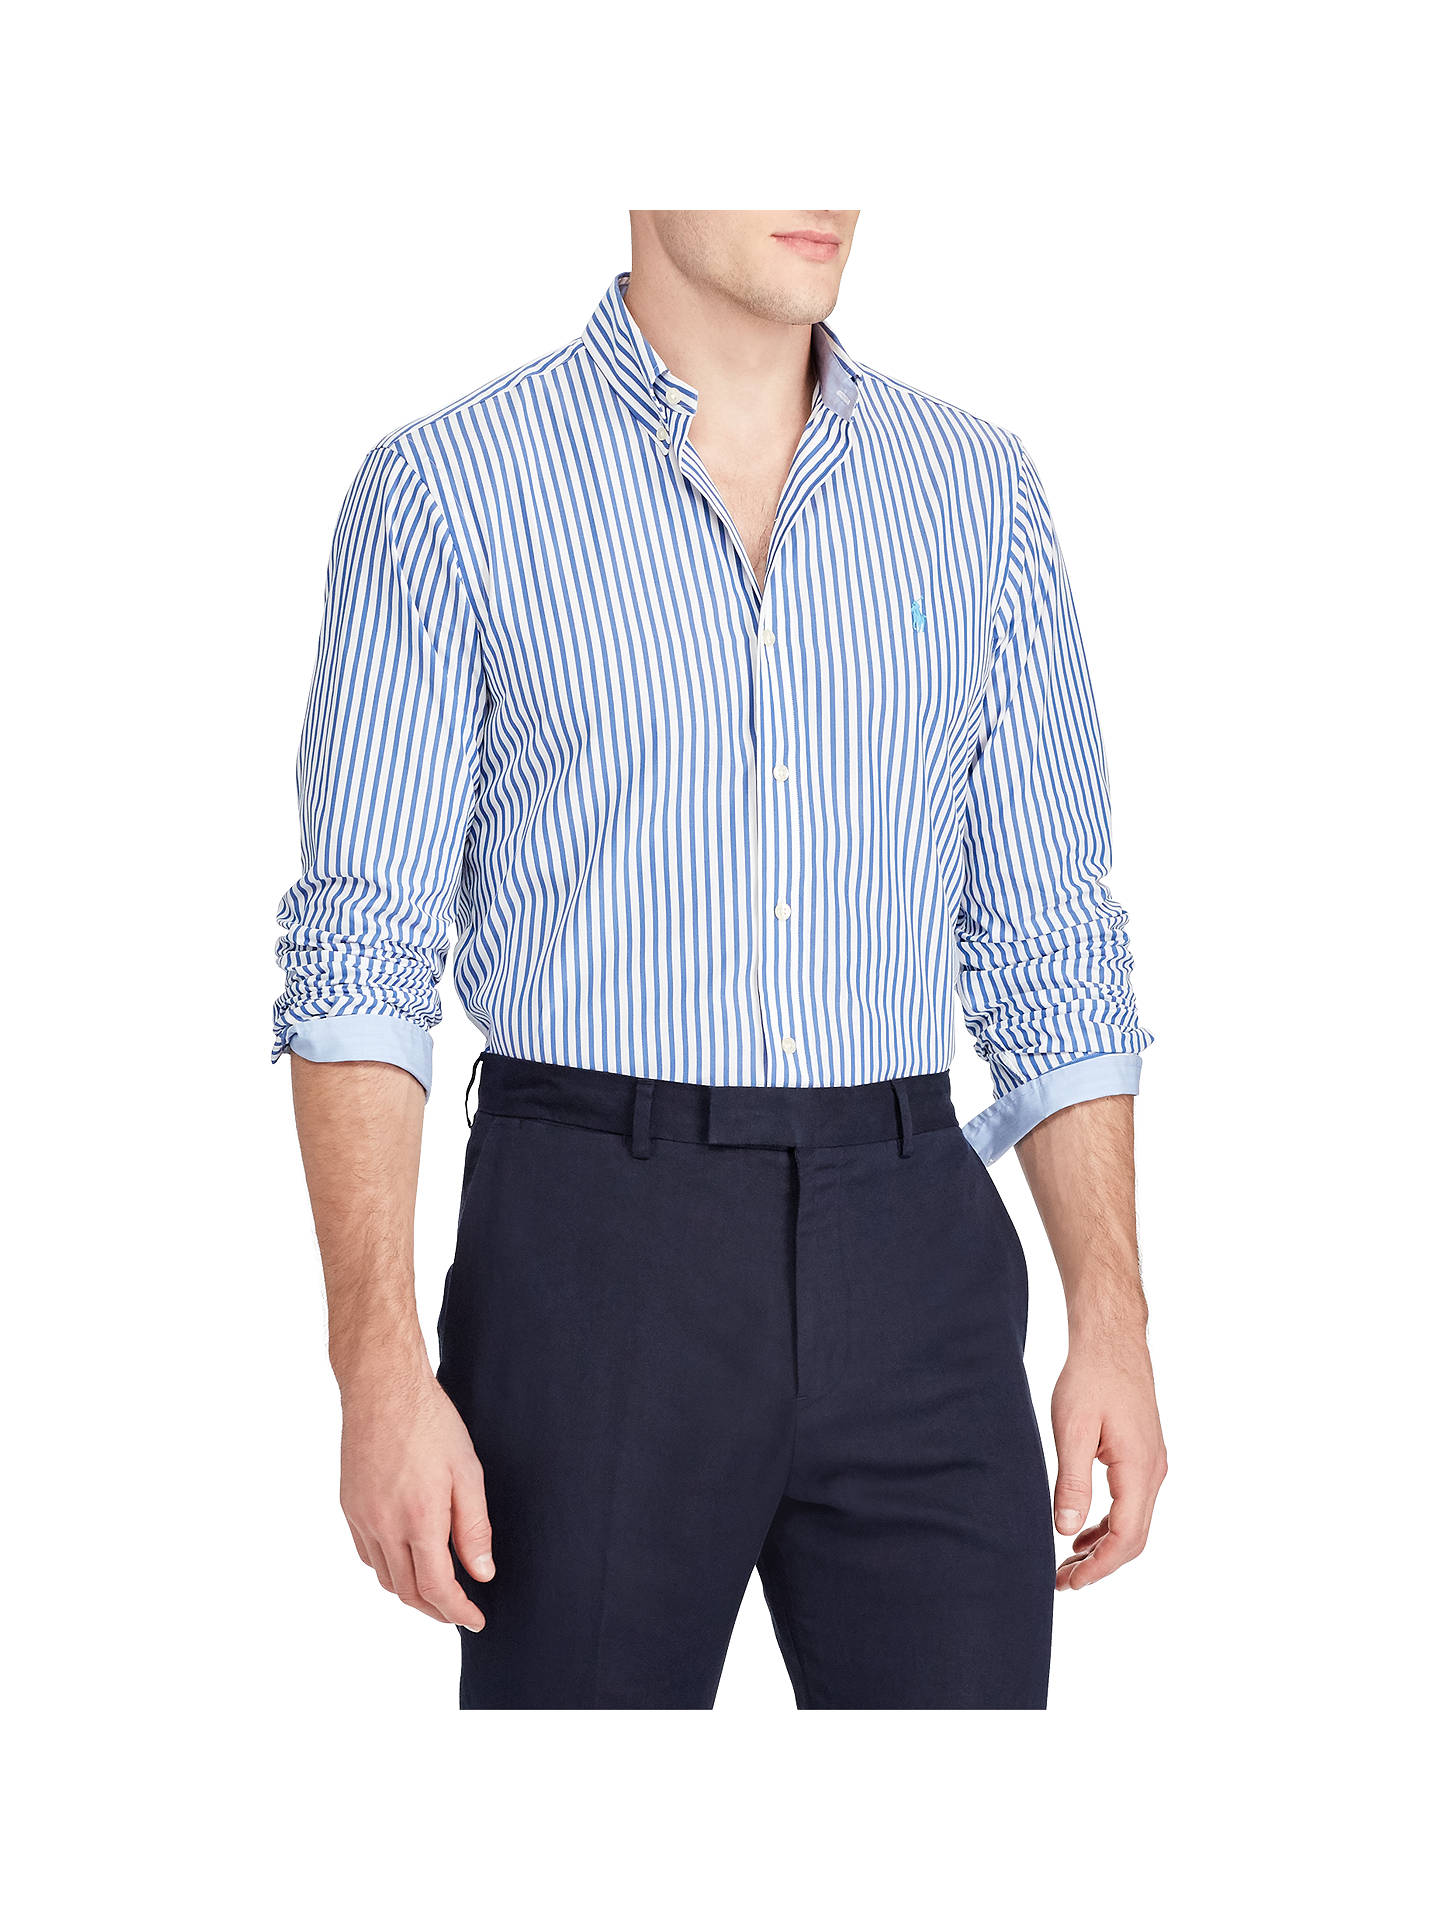 9ea4a454d Buy Polo Ralph Lauren Slim Fit Stripe Cotton Poplin Shirt